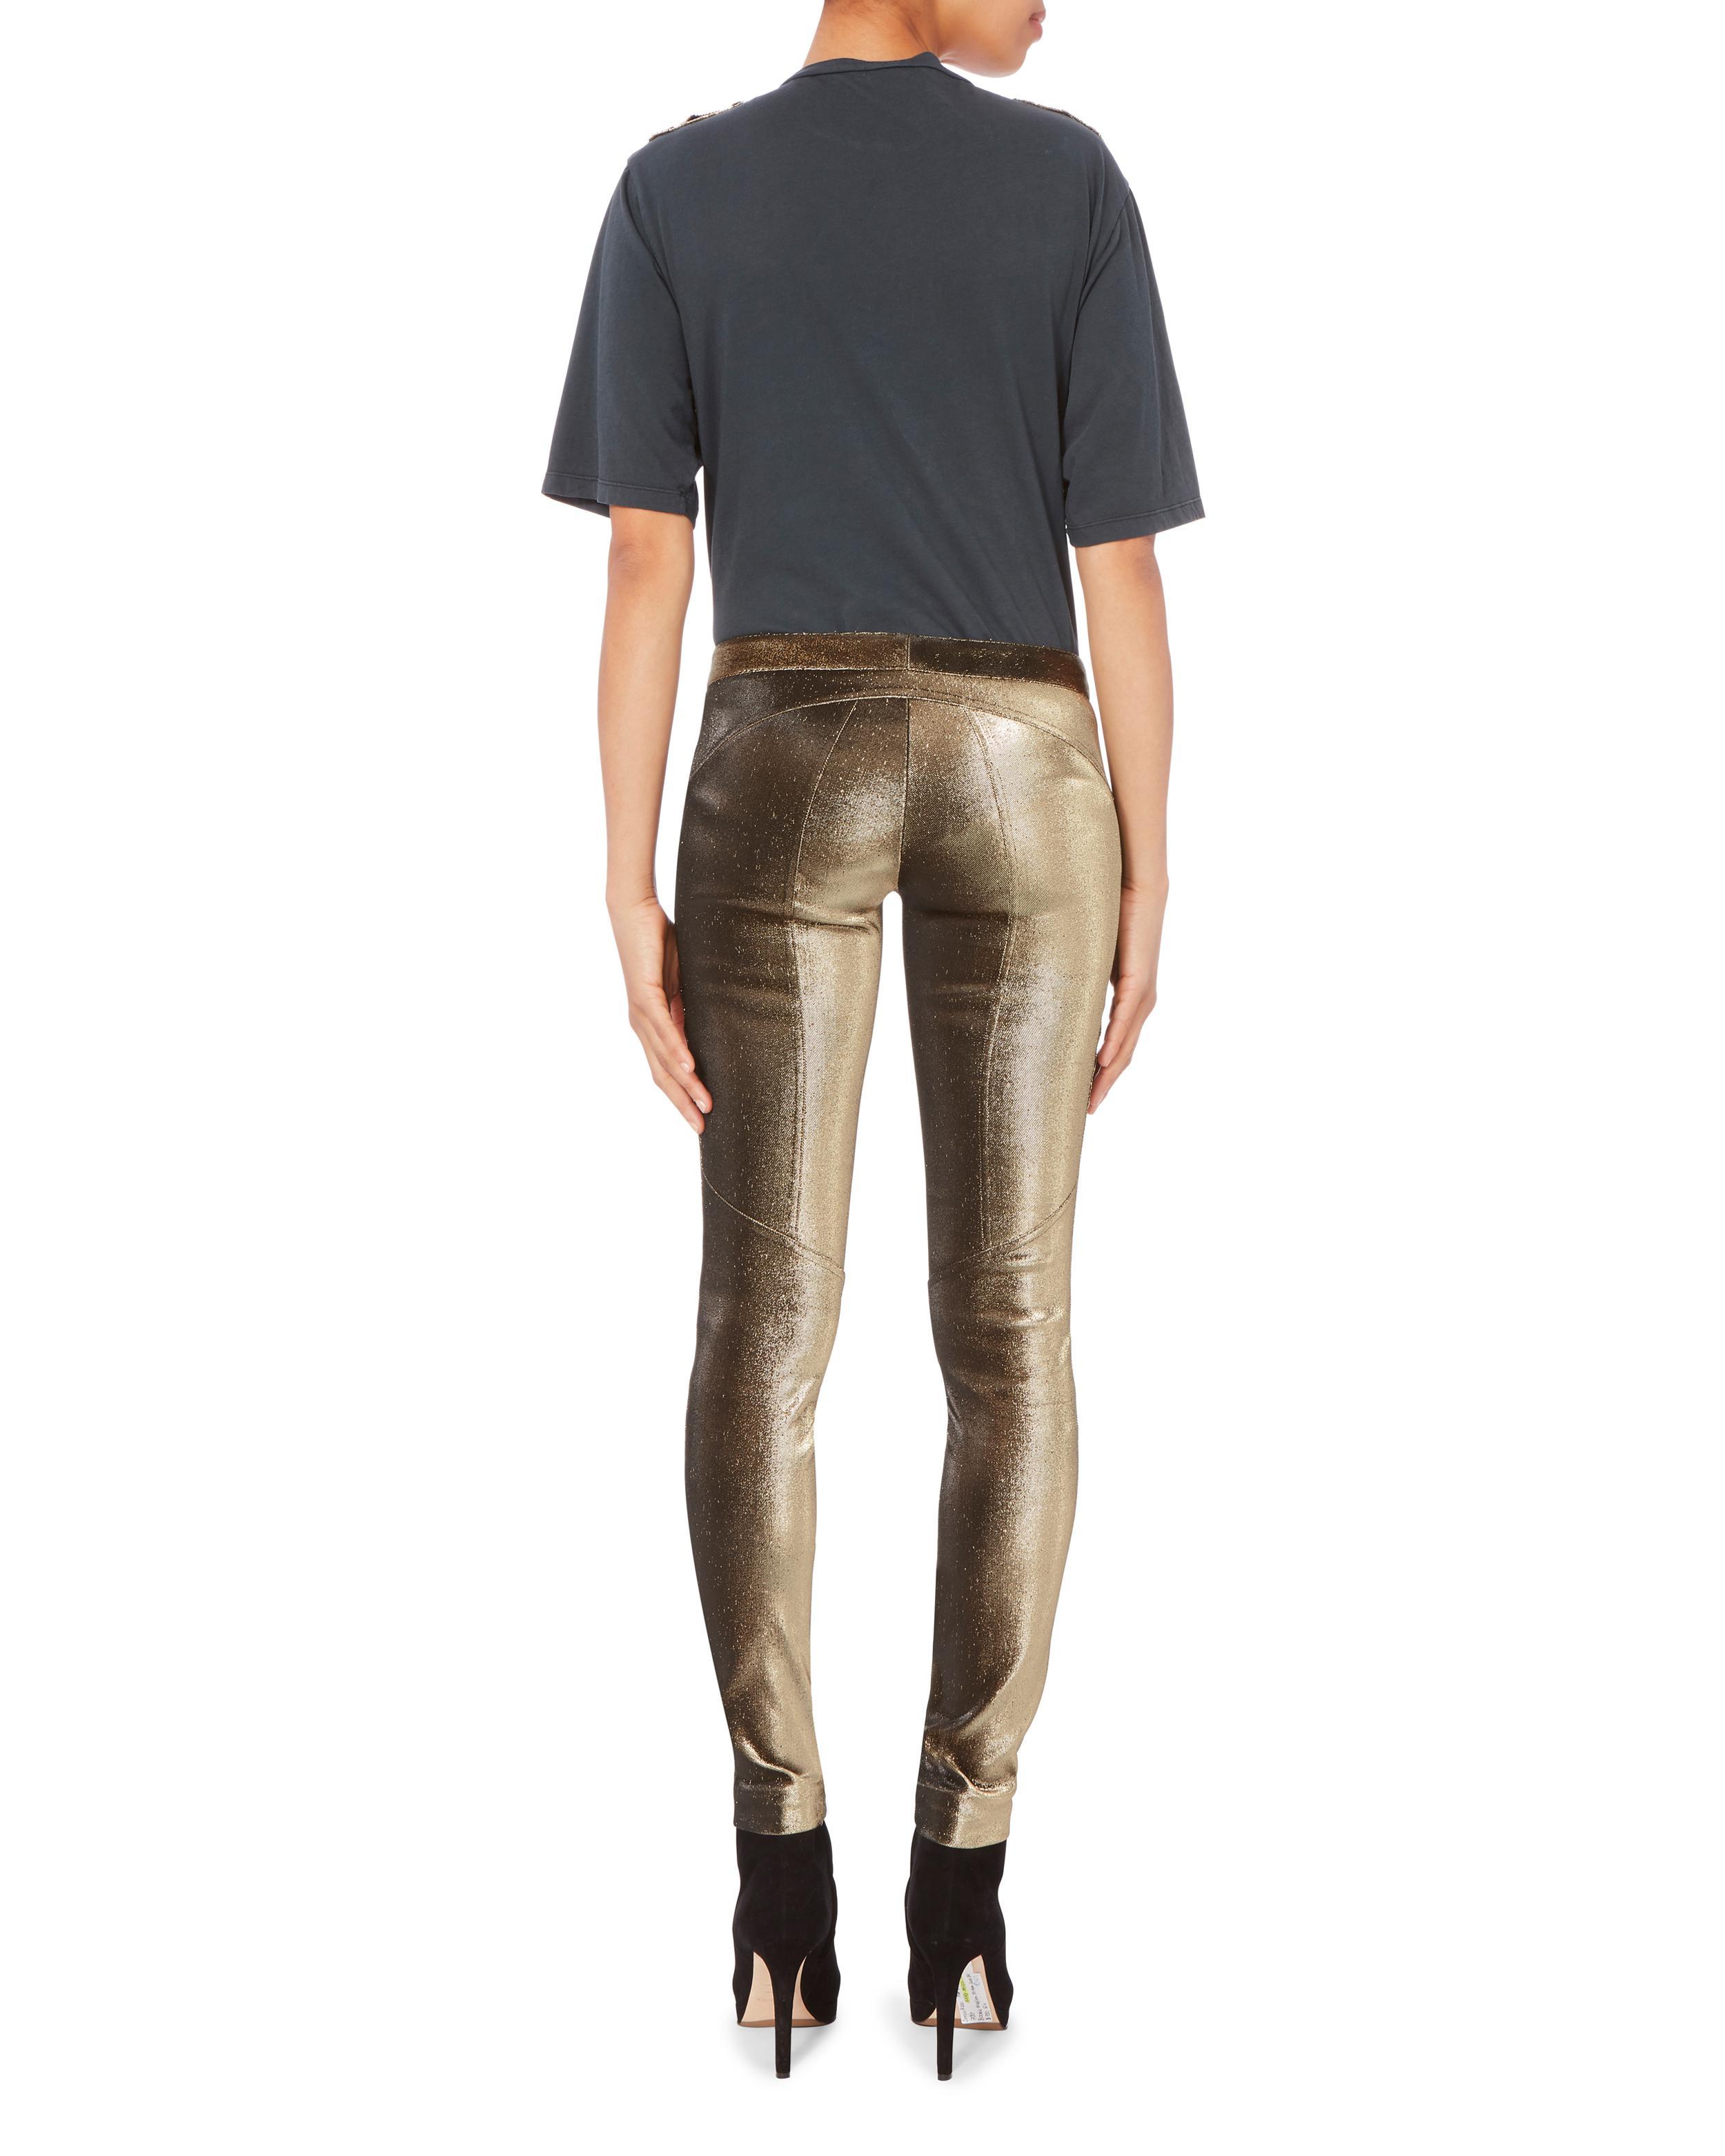 Pantalon De Piste Métalliques Barbara Bui WWjcw